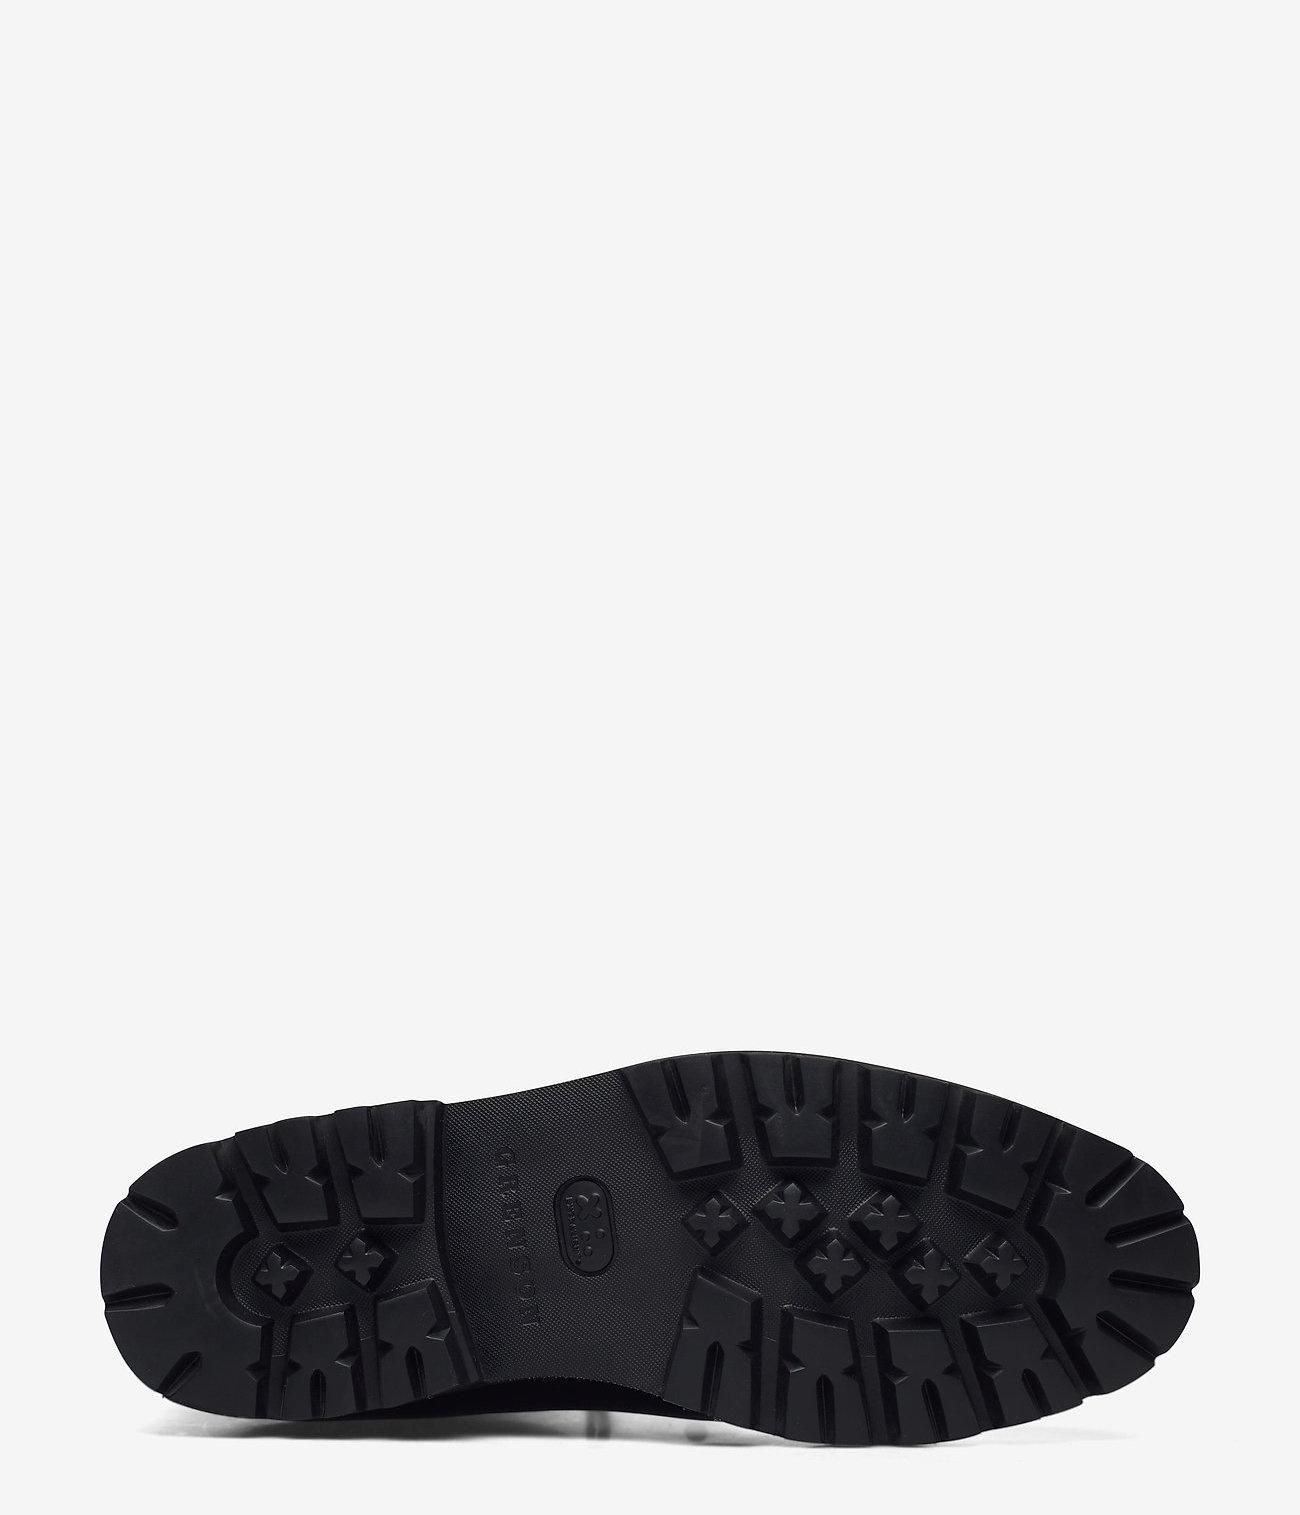 Grenson Enkellaarzen, zwart